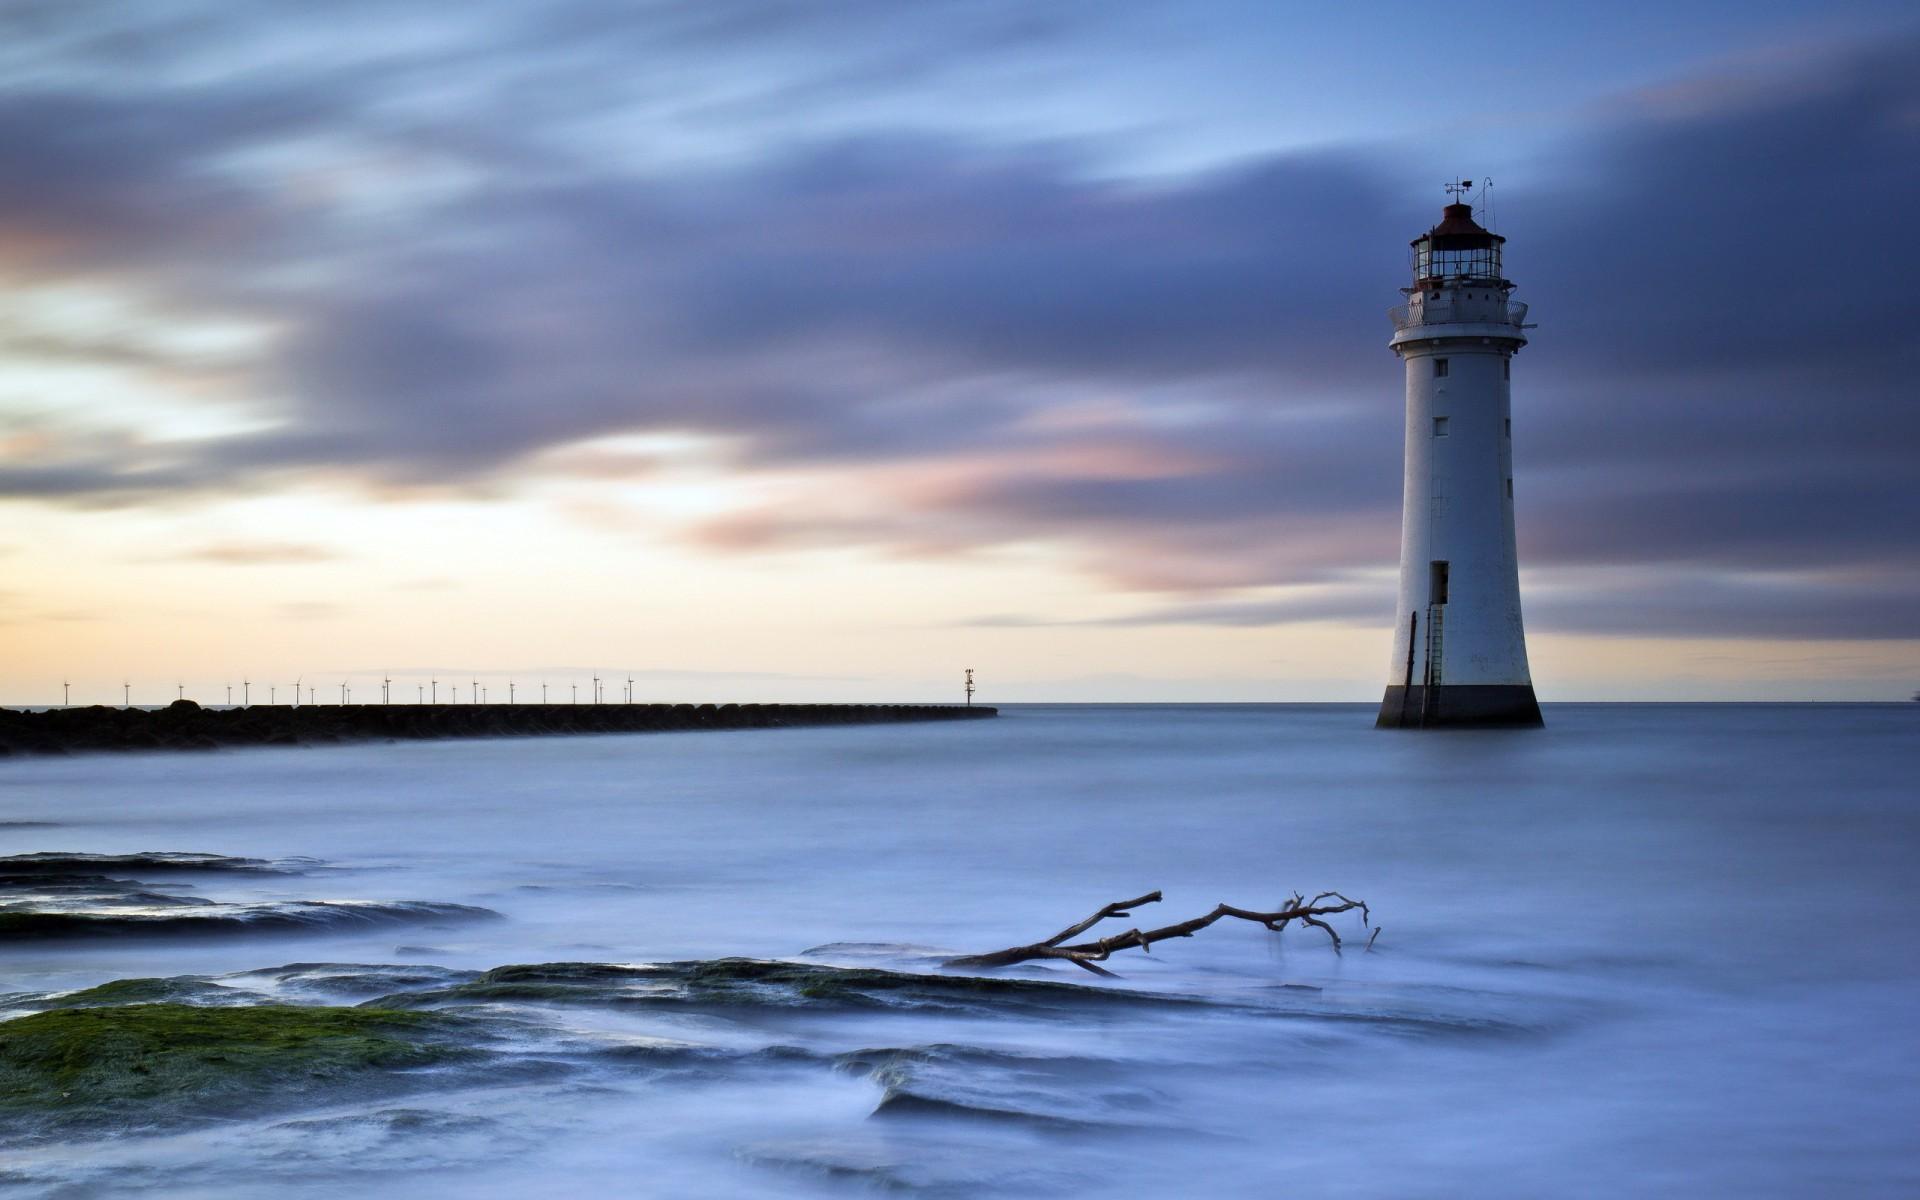 Sea aeYaeY lighthouse night landscape ocean wallpaper     69558    WallpaperUP